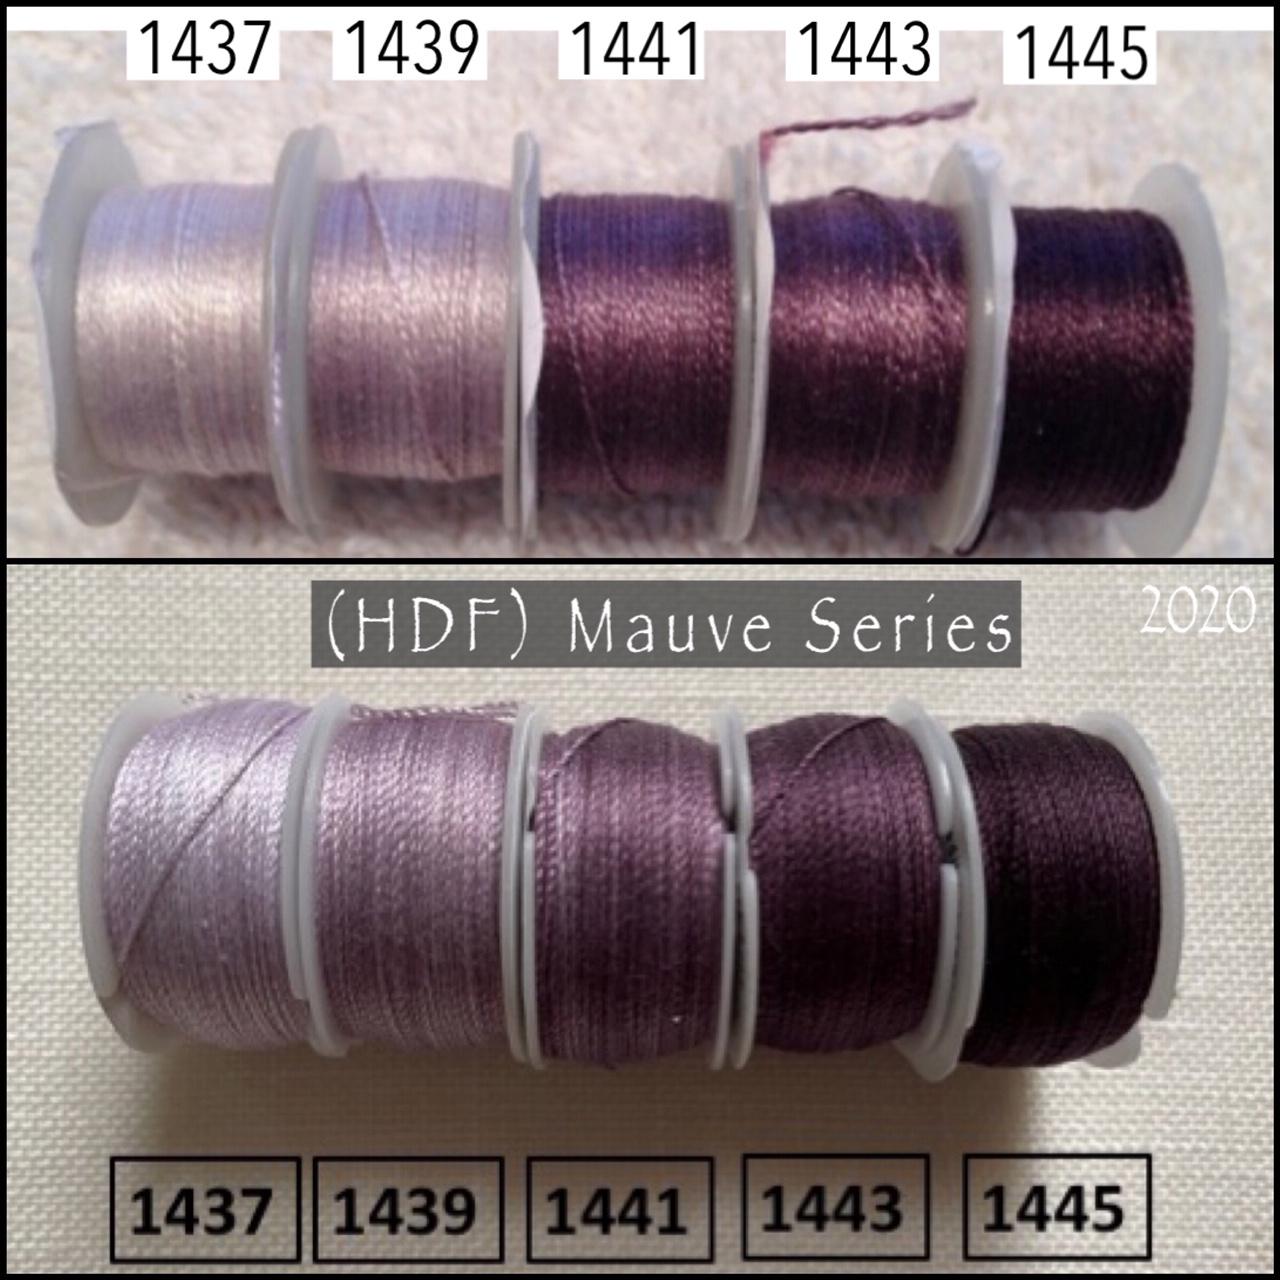 Mauve Series